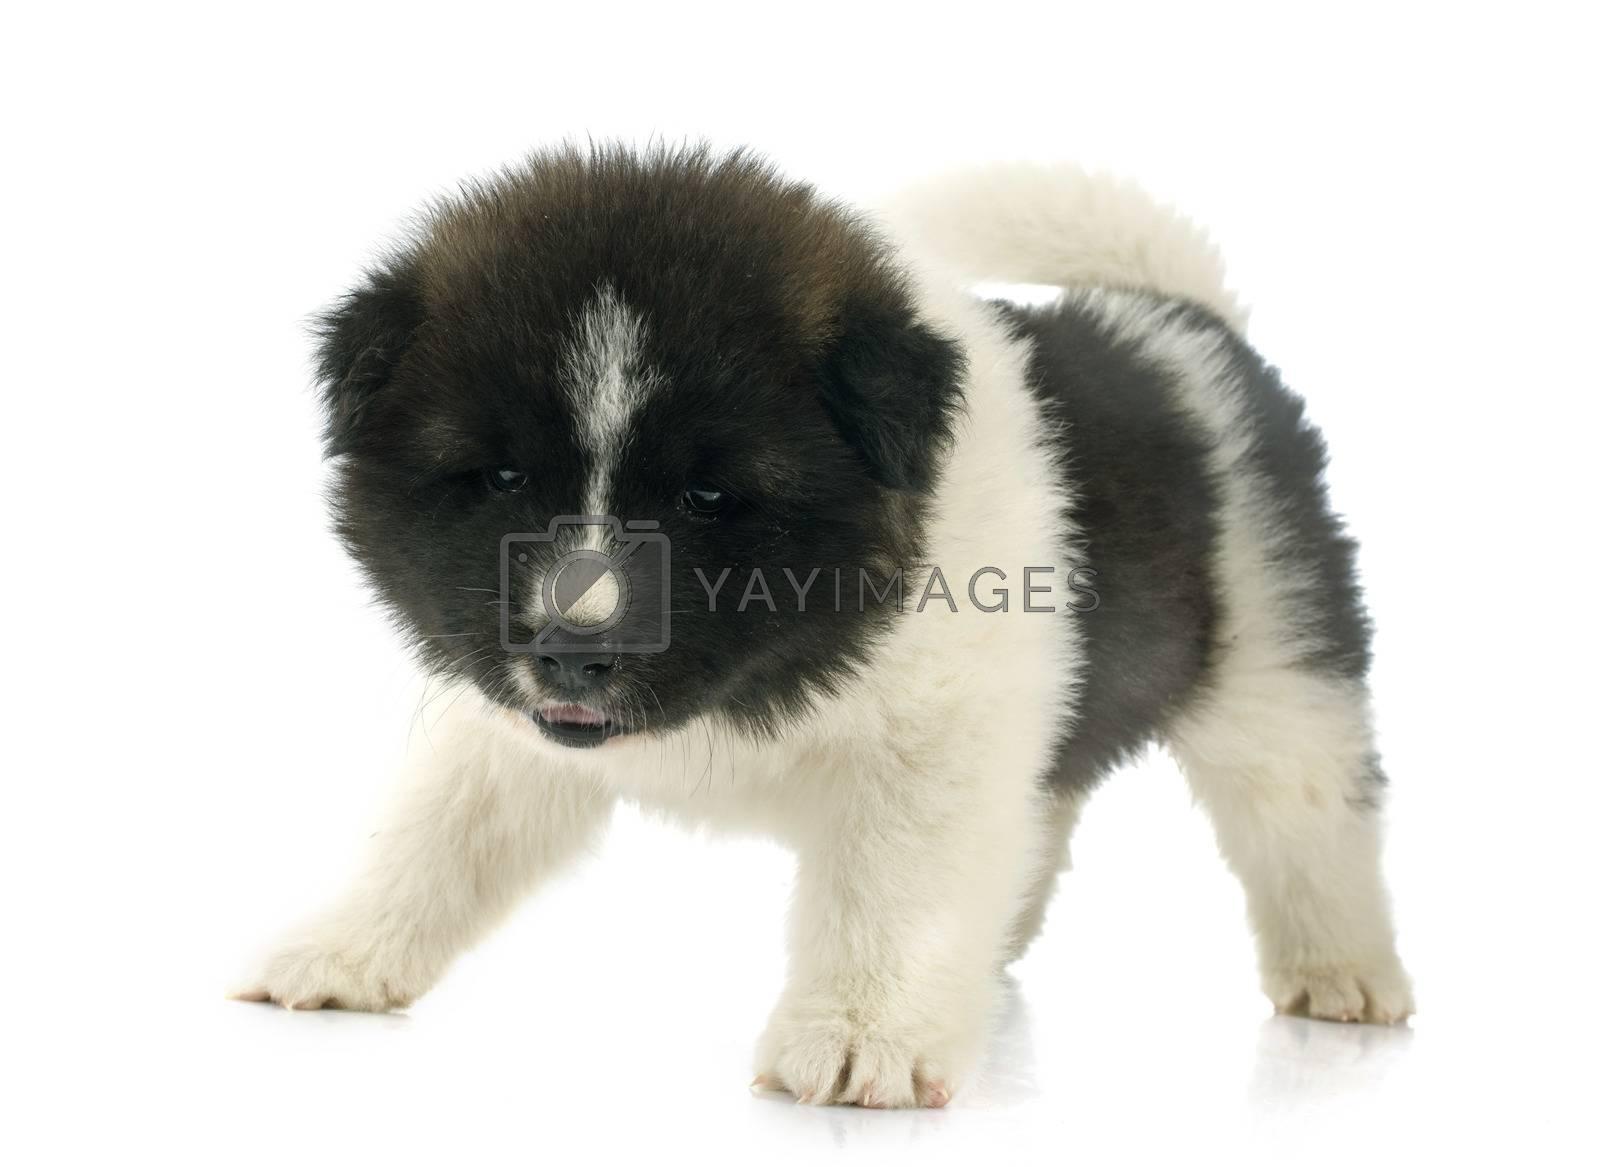 Royalty free image of puppy american akita by cynoclub